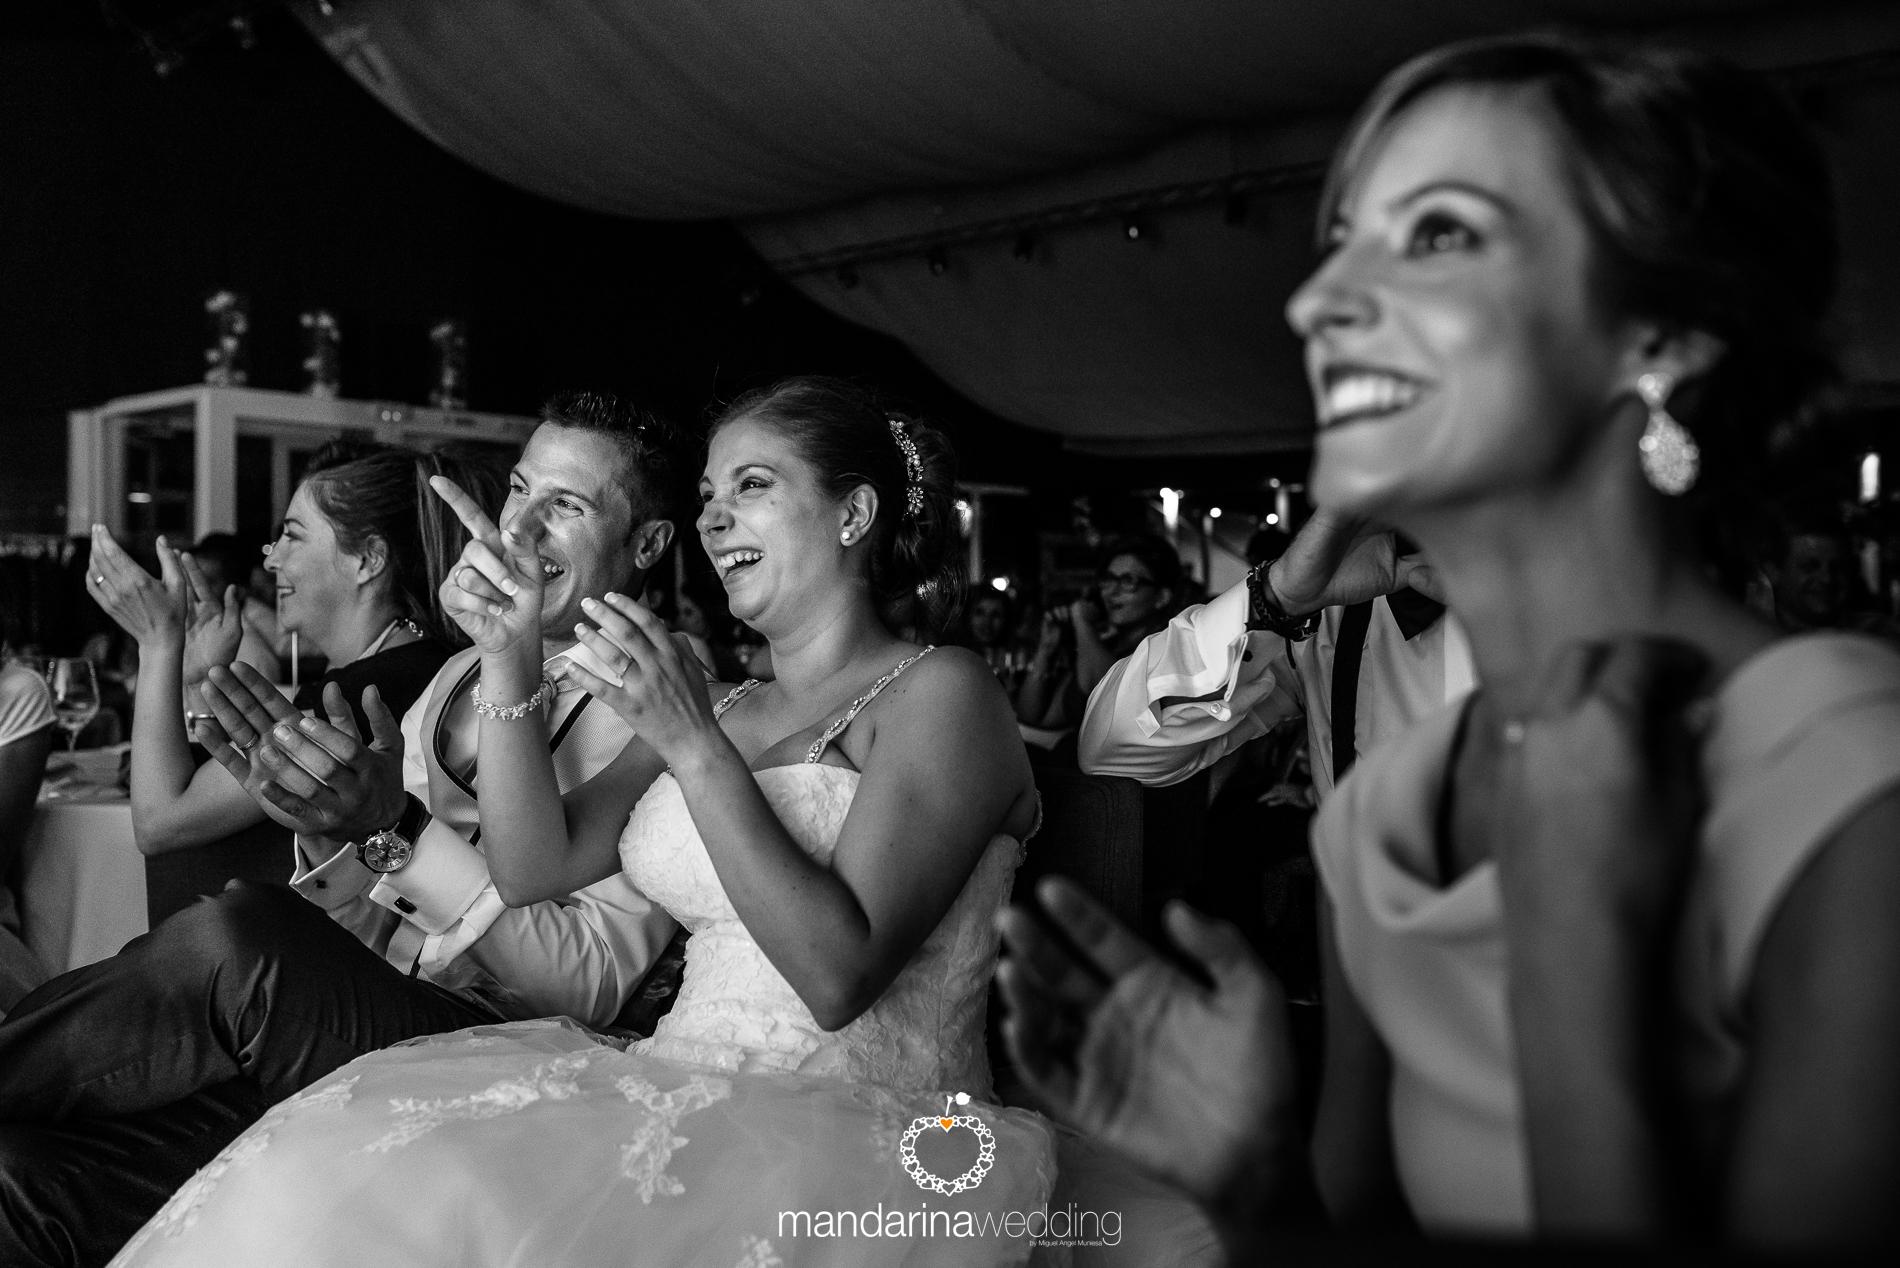 mandarina wedding, mejores fotografos boda, fotografo zaragoza, fotografo huesca, fotografo soria, fotografo lerida_35